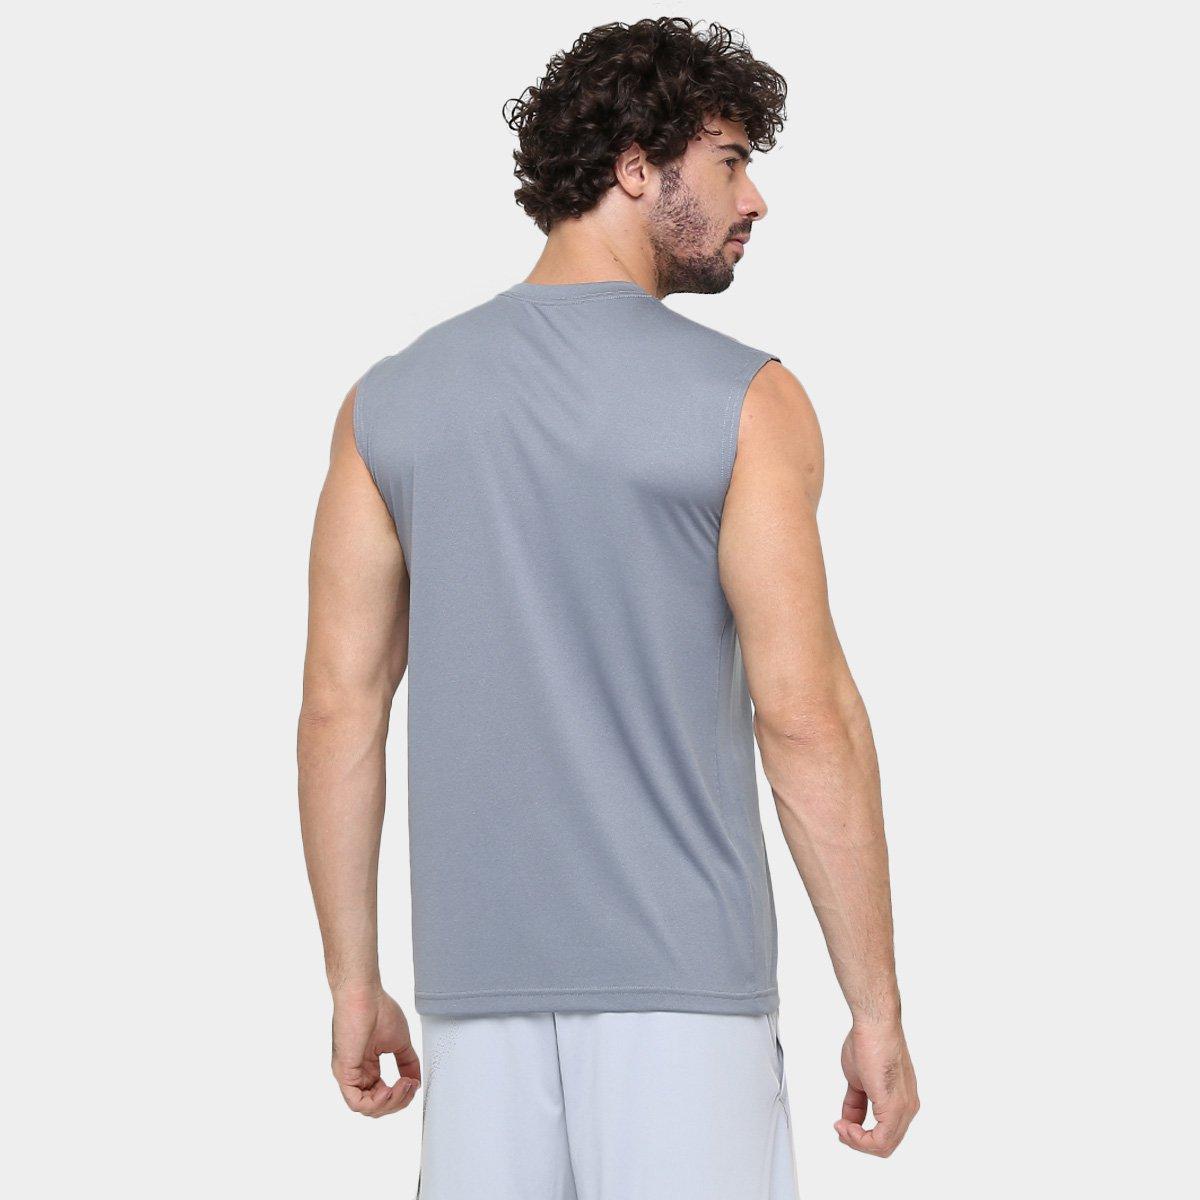 Camiseta Regata Nike Legend 2.0 Tee Masculina - Cinza e Preto ... e9c9a44af31